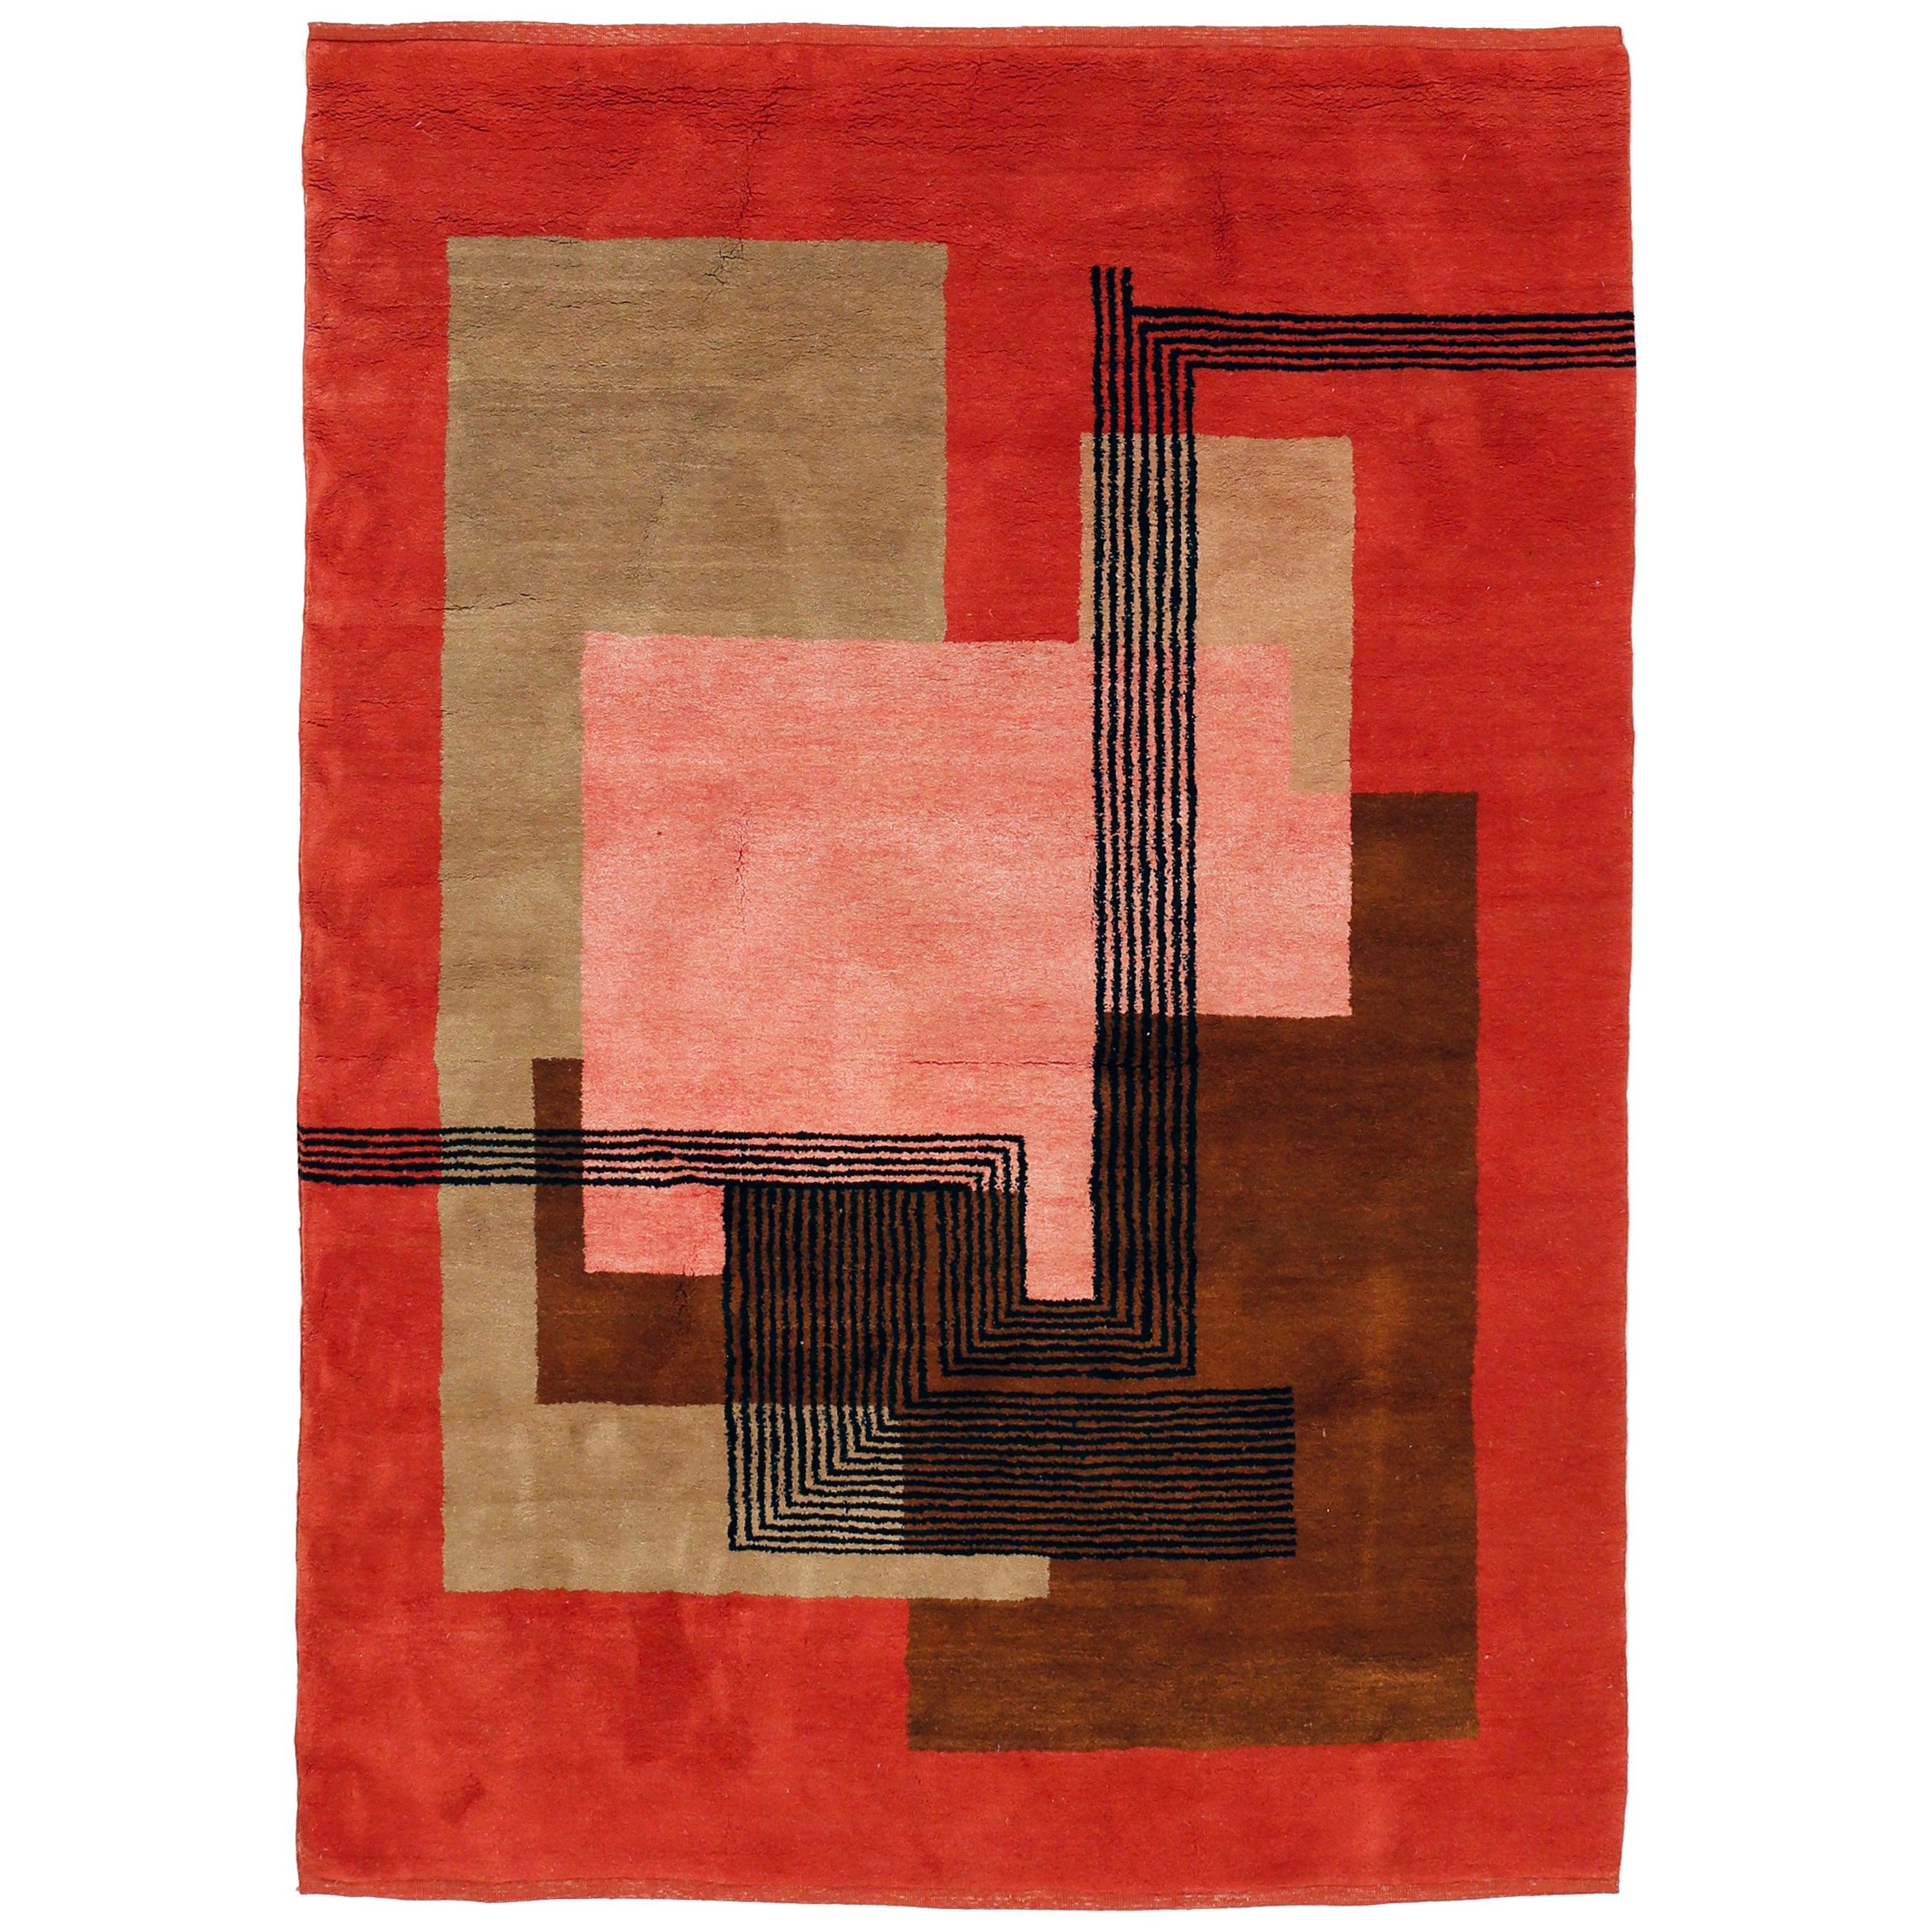 Vintage Art Deco Cubist Design Rug in the Style of Ivan da Silva Bruhns